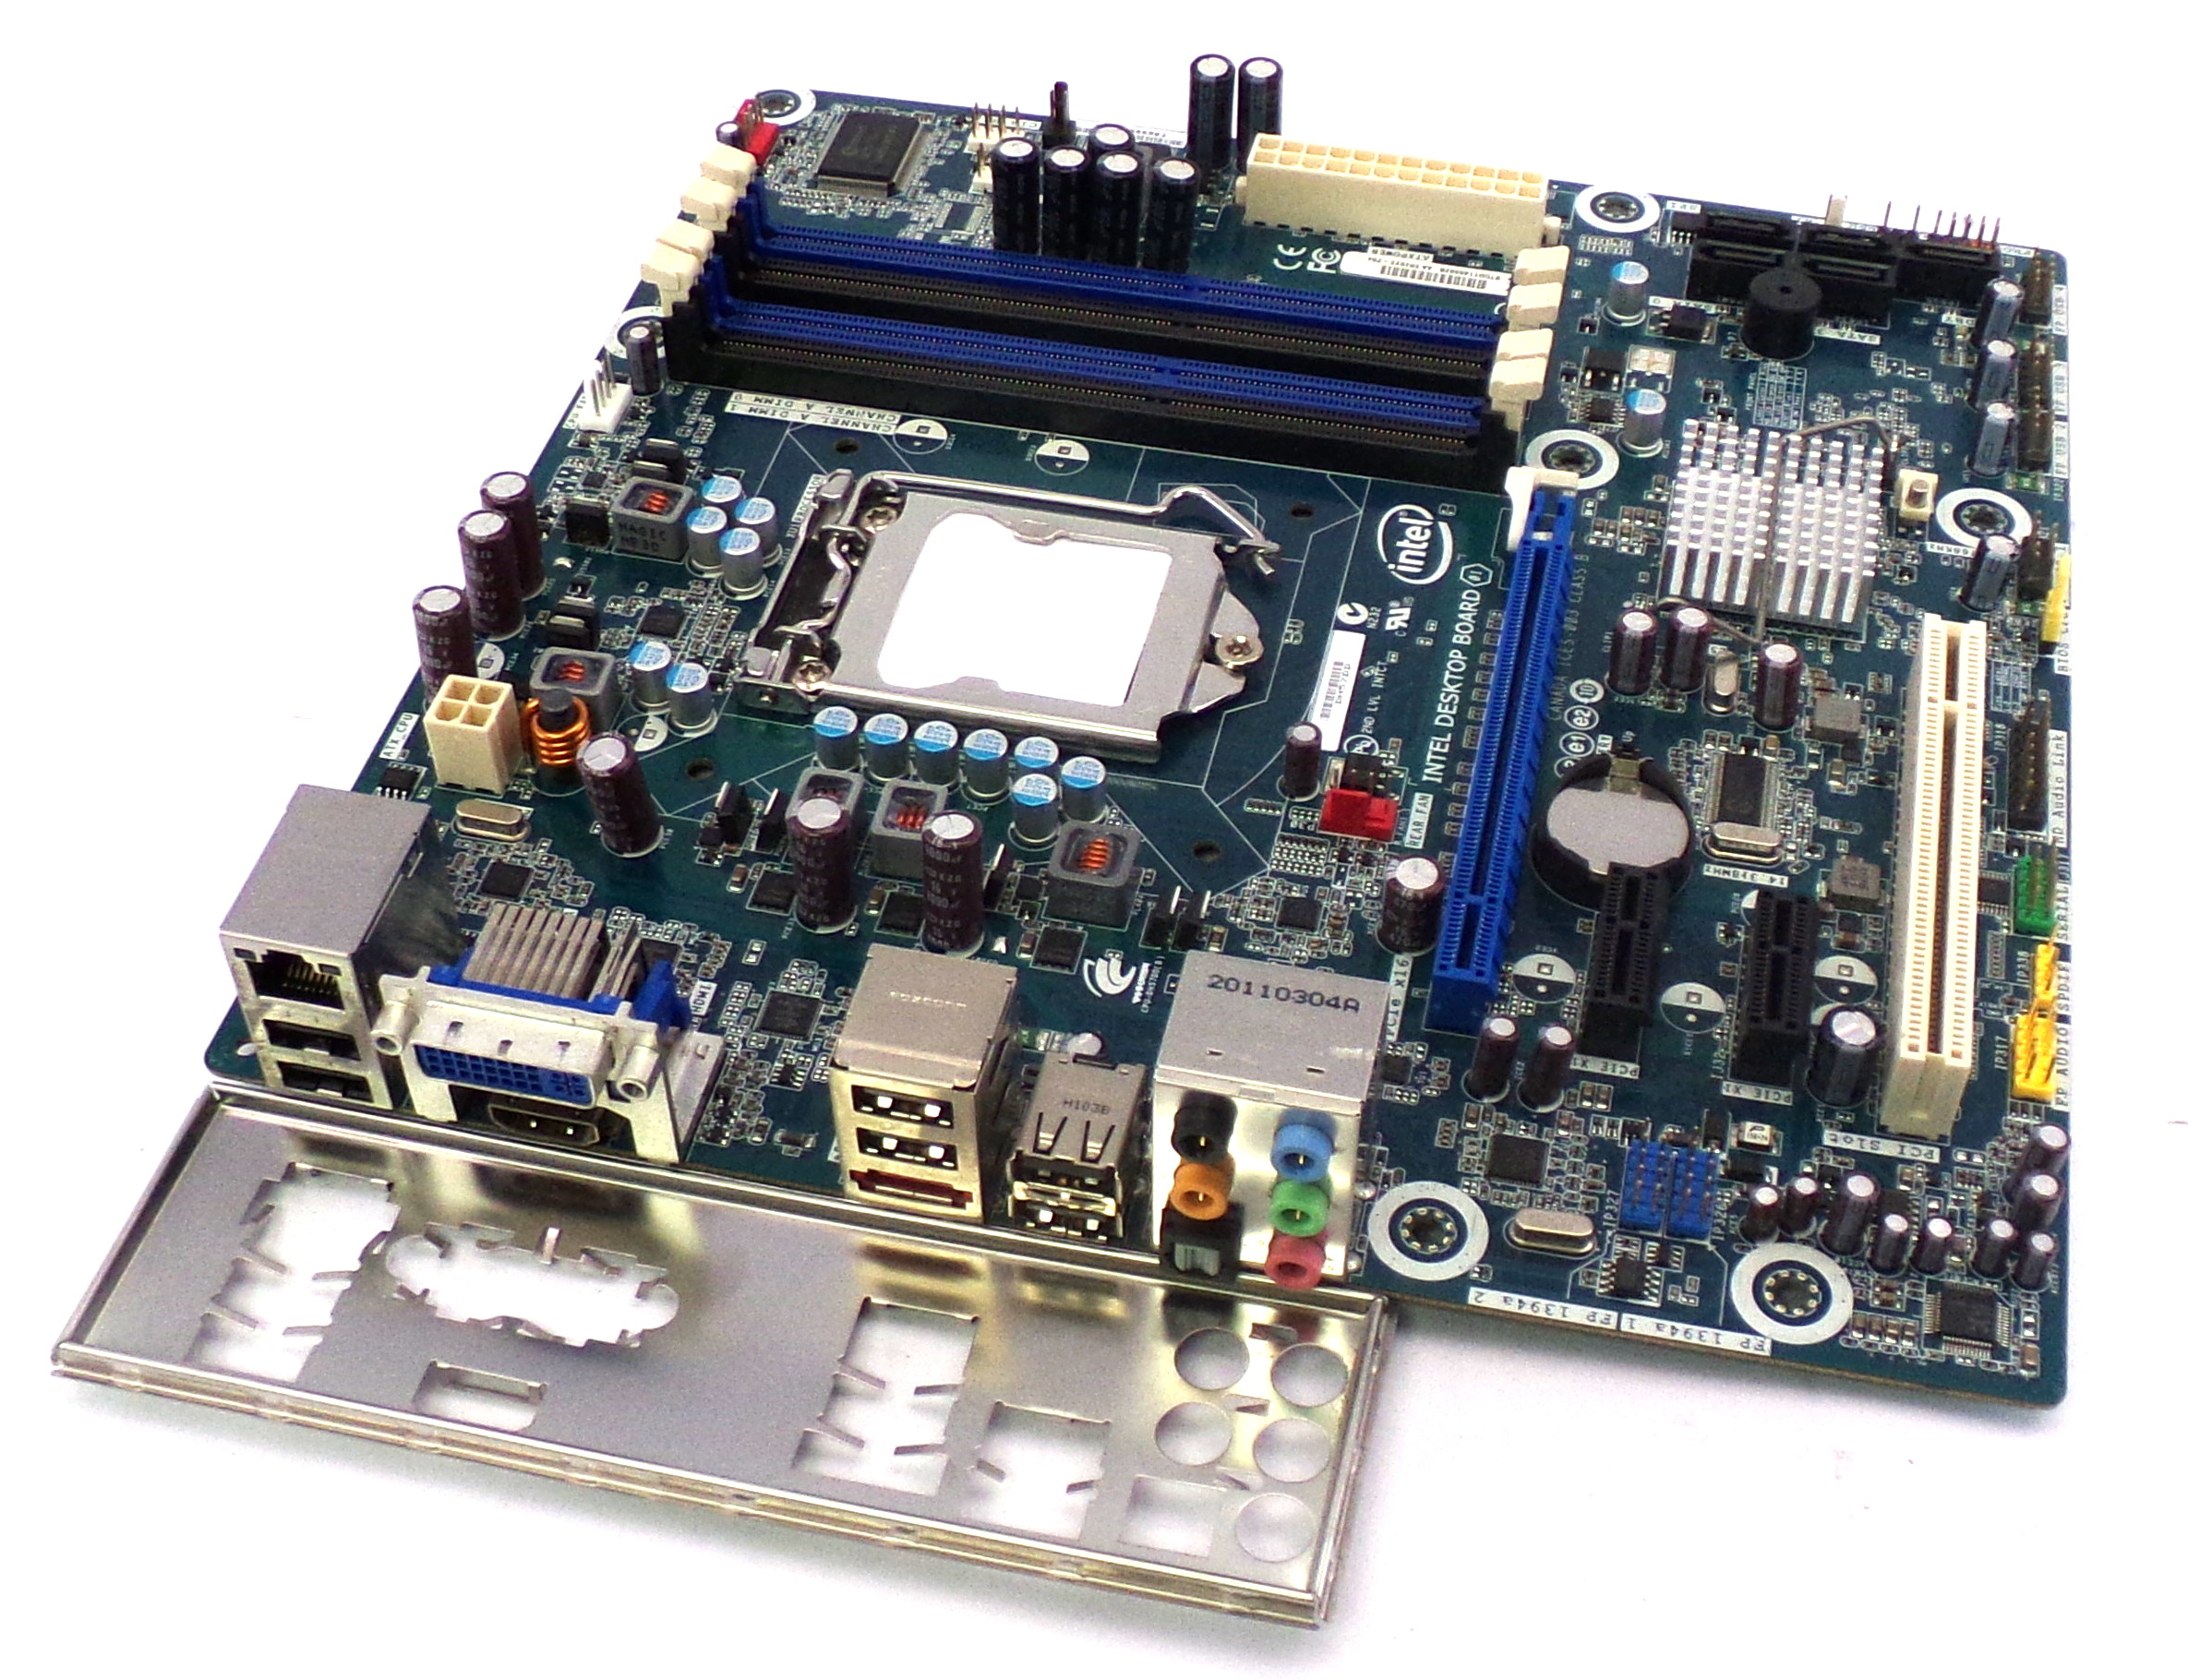 Intel DH57DD Socket LGA1156 DDR3-1333MHz Motherboard